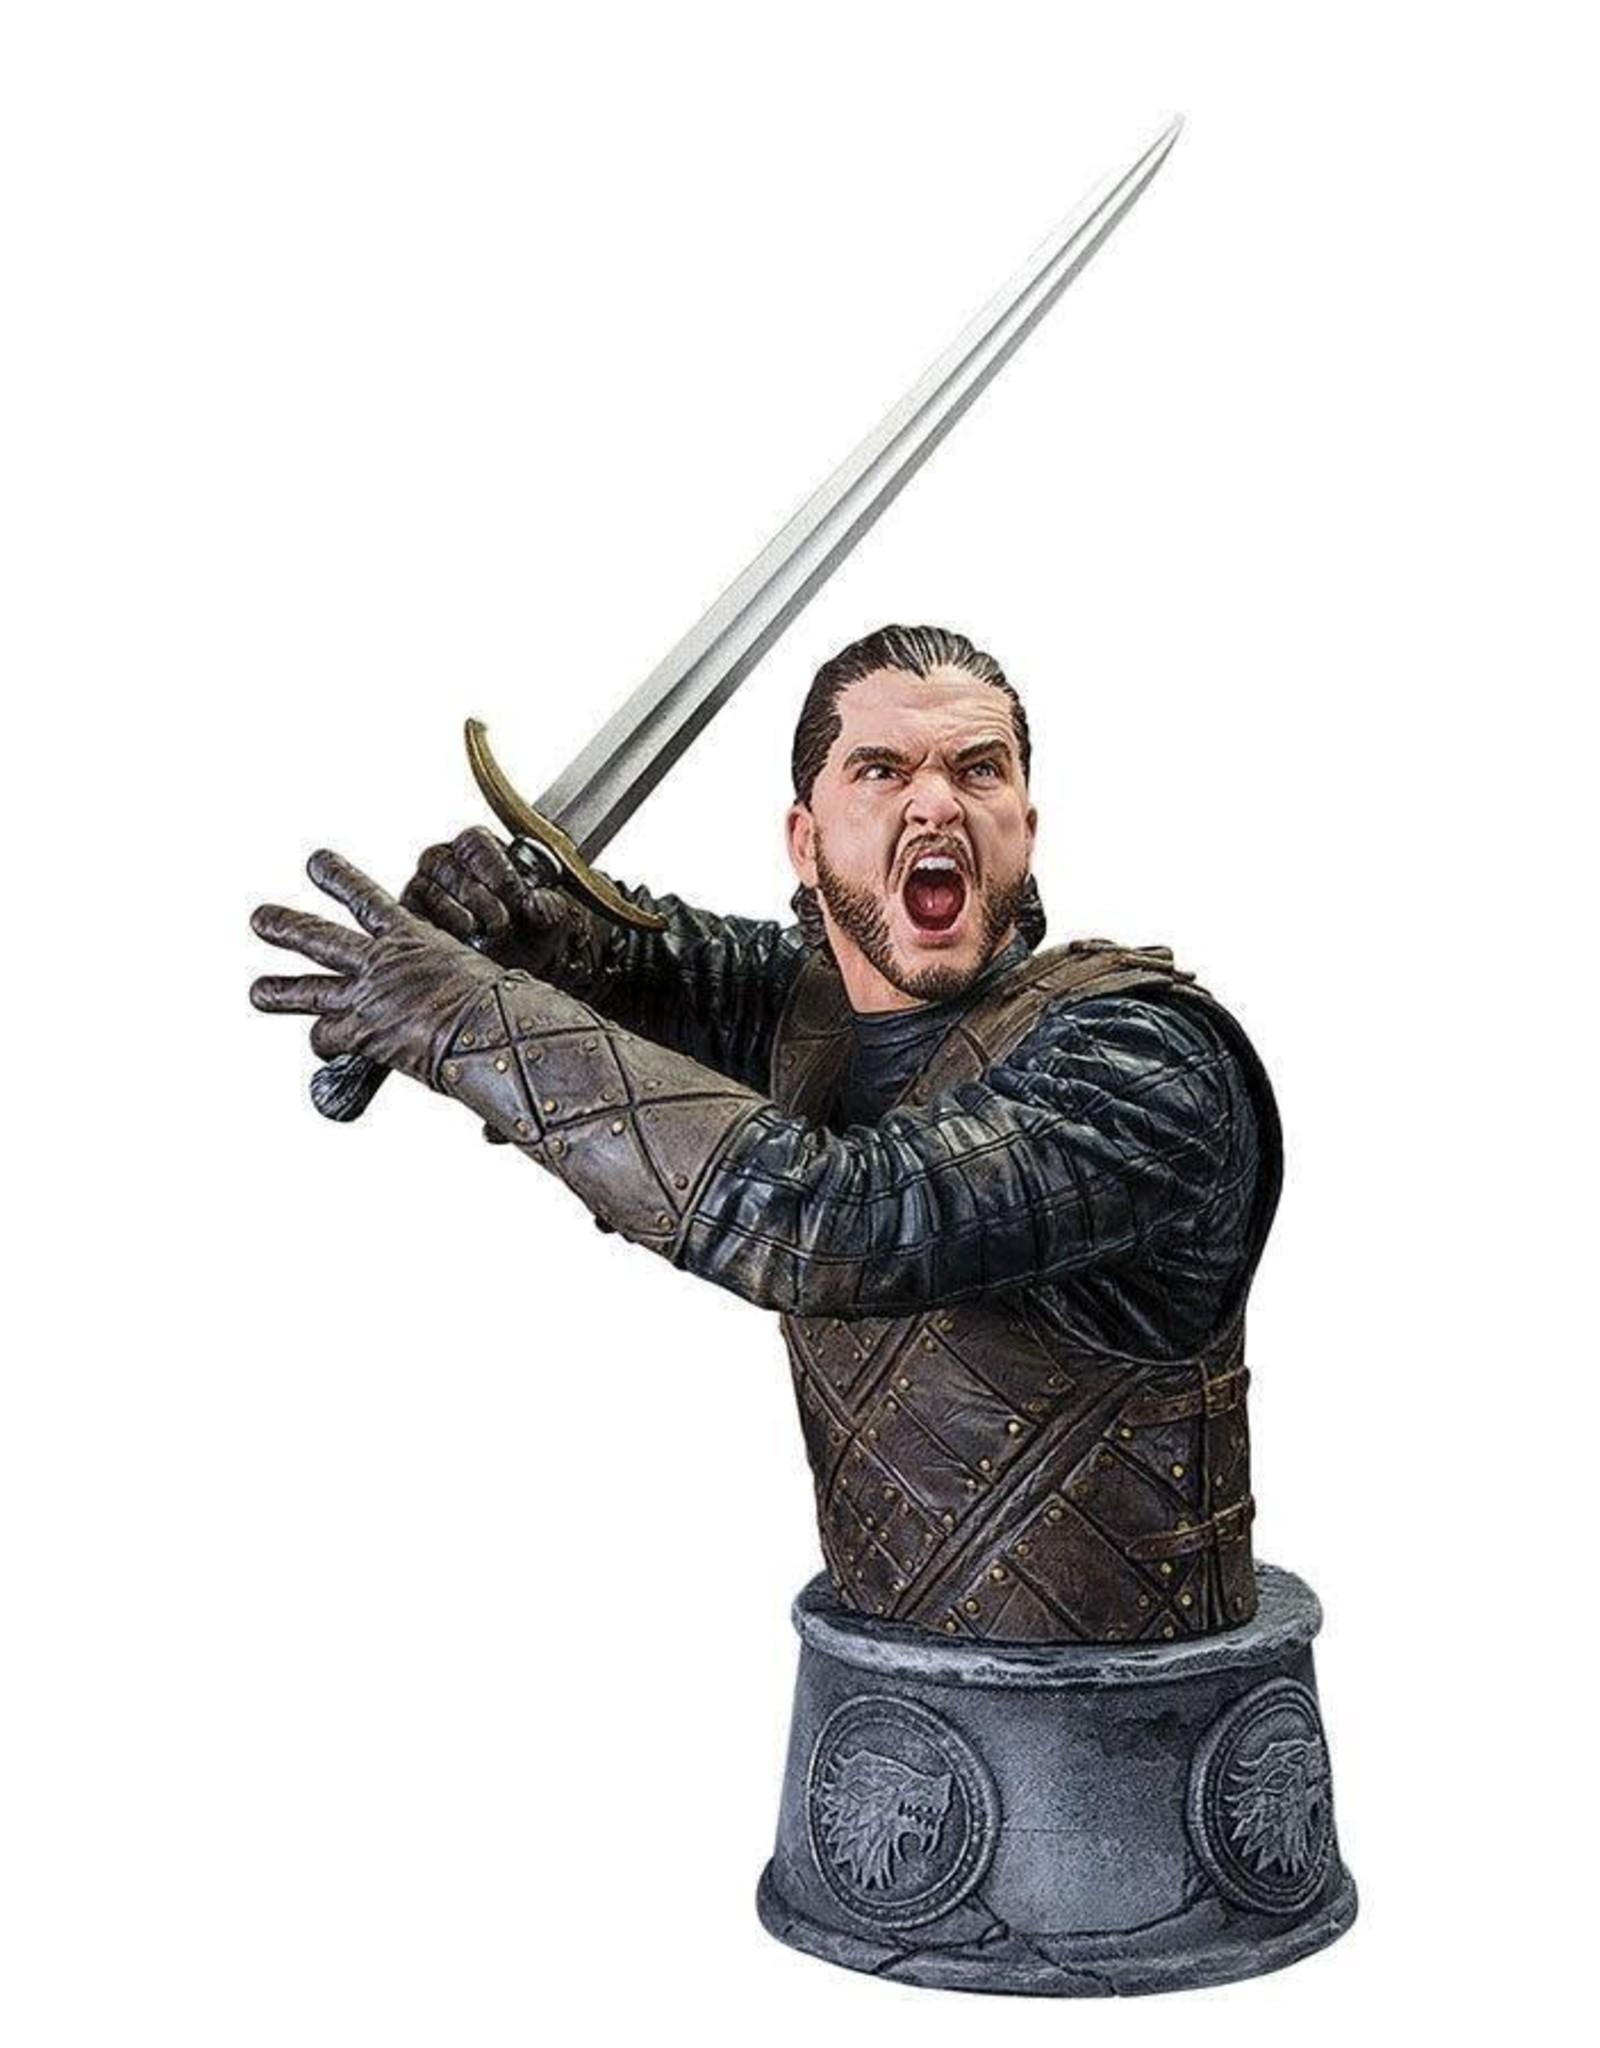 GAME OF THRONES - Jon Snow Battle of the Bastard Bust - 15cm